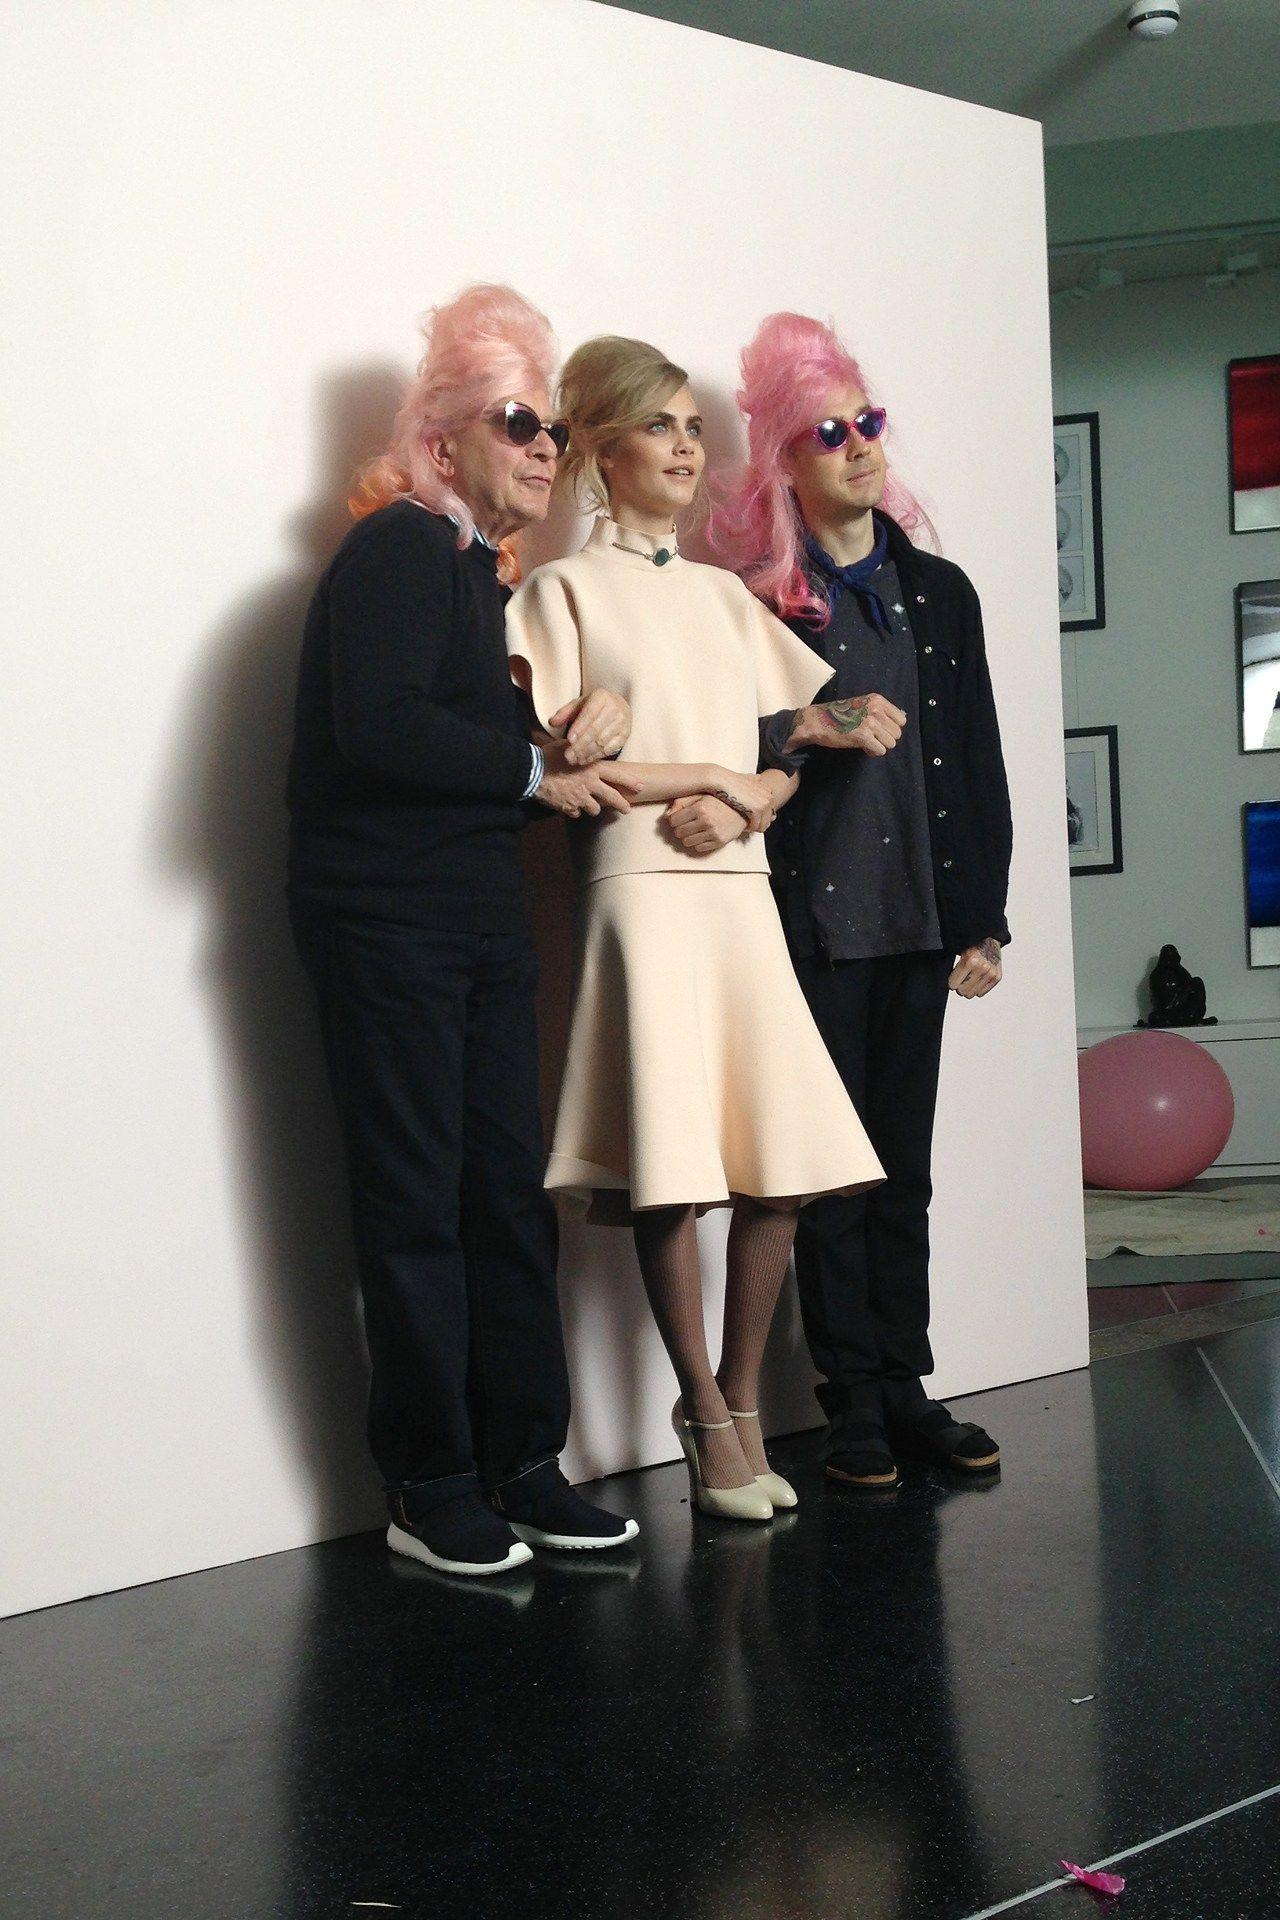 Cara Delevingne Vogue Shoot - Behind The Scenes Pictures